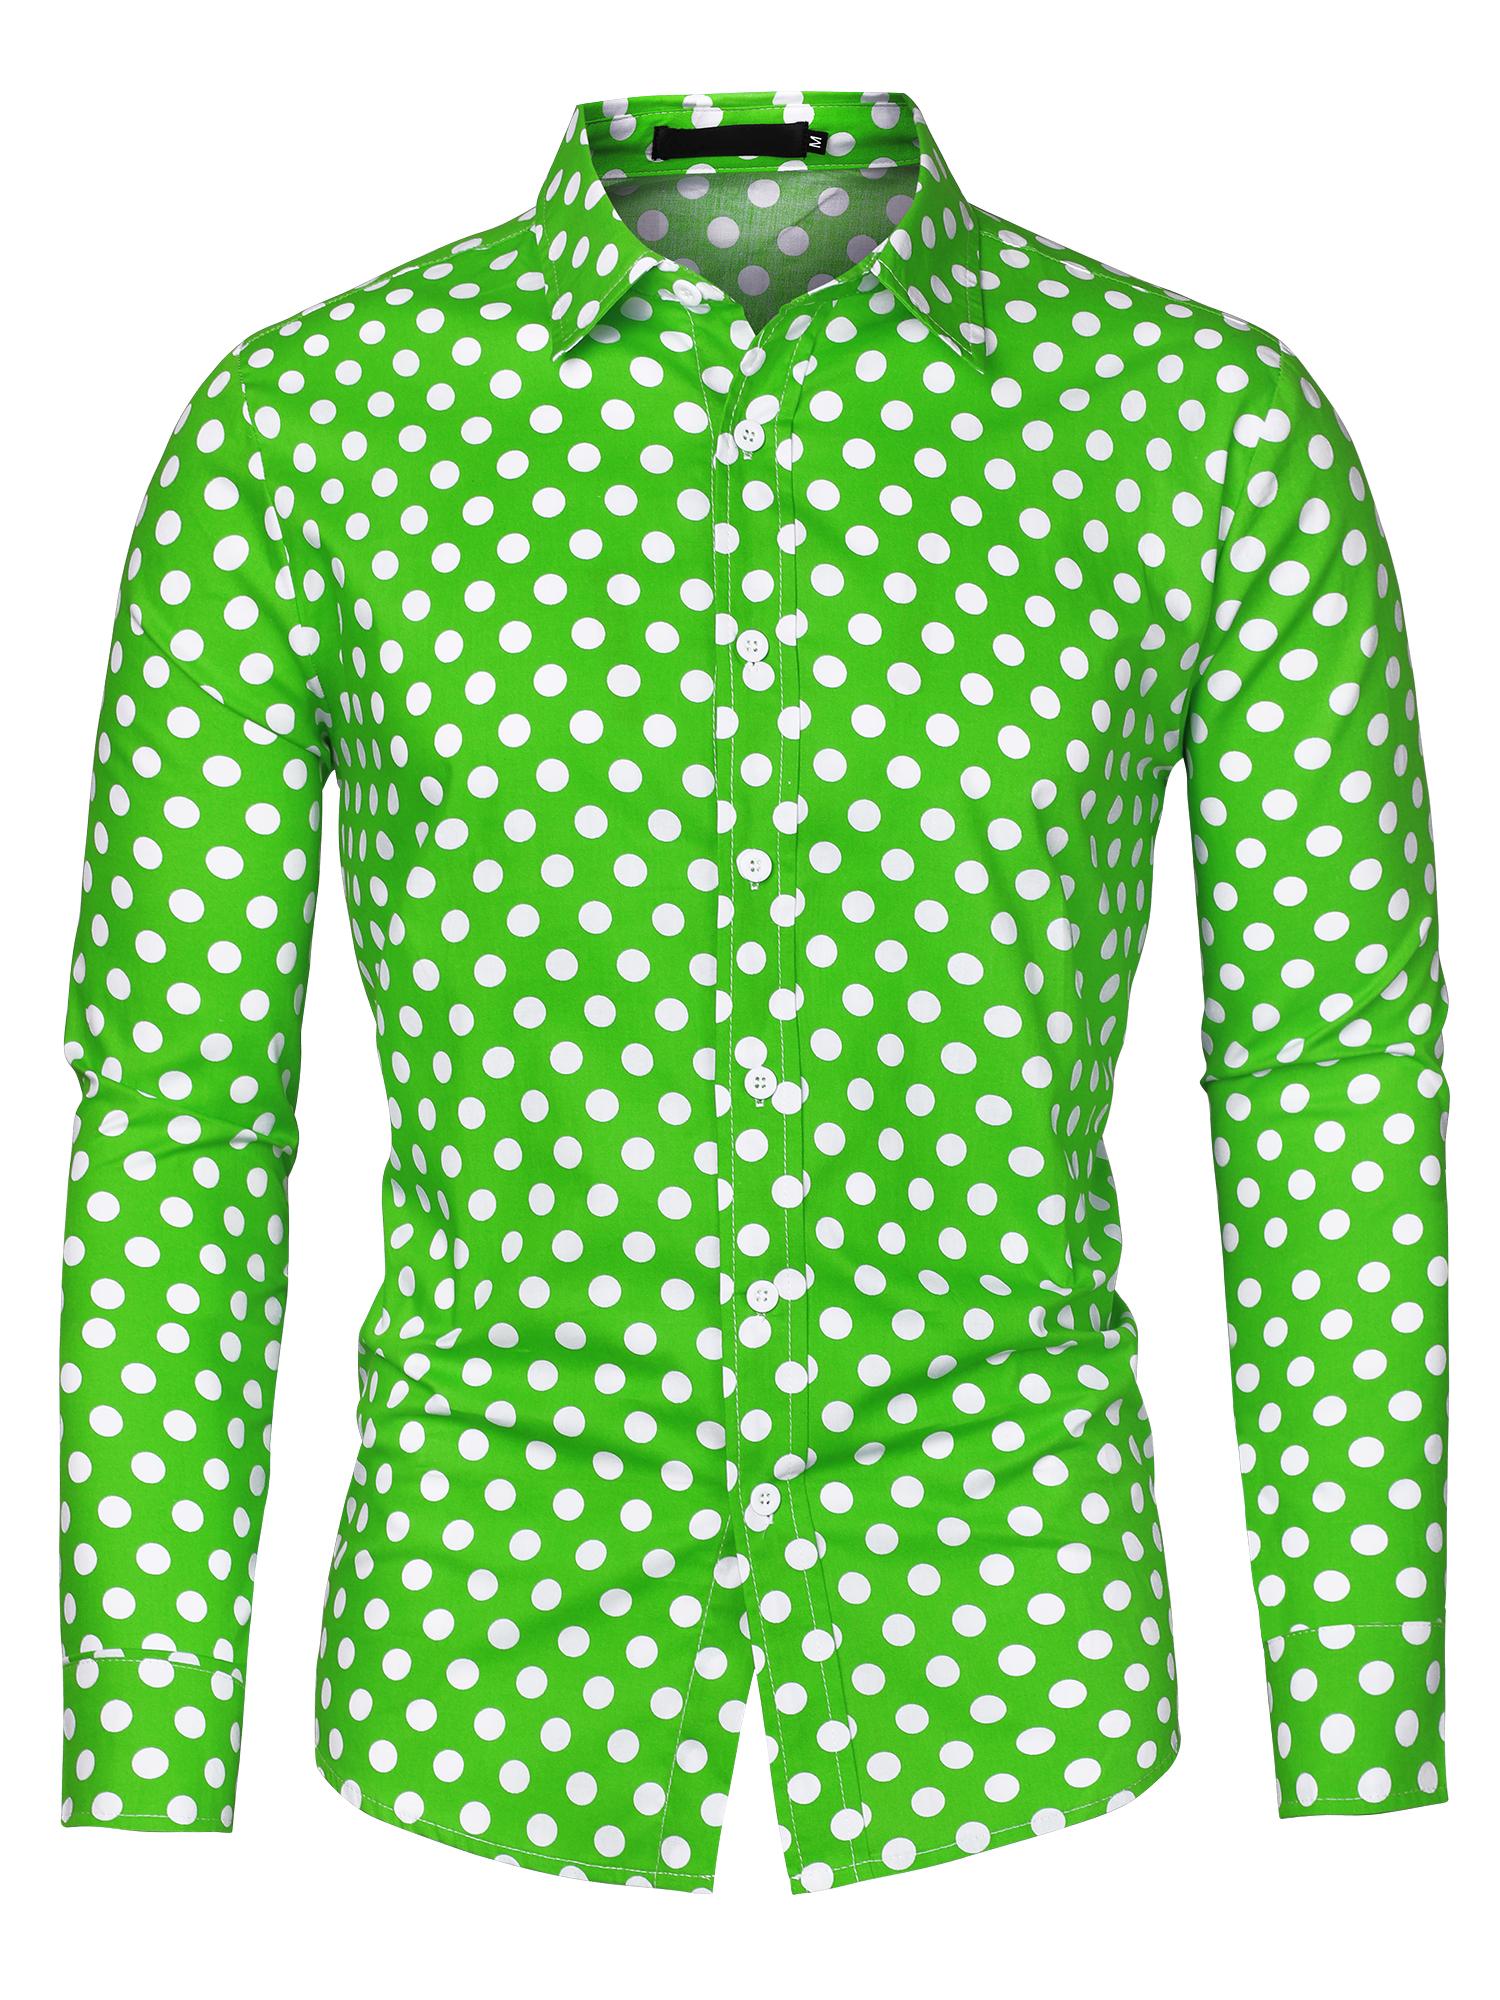 Men 100% Cotton Polka Dots Long Sleeve Slim Fit Dress Shirt Green 46